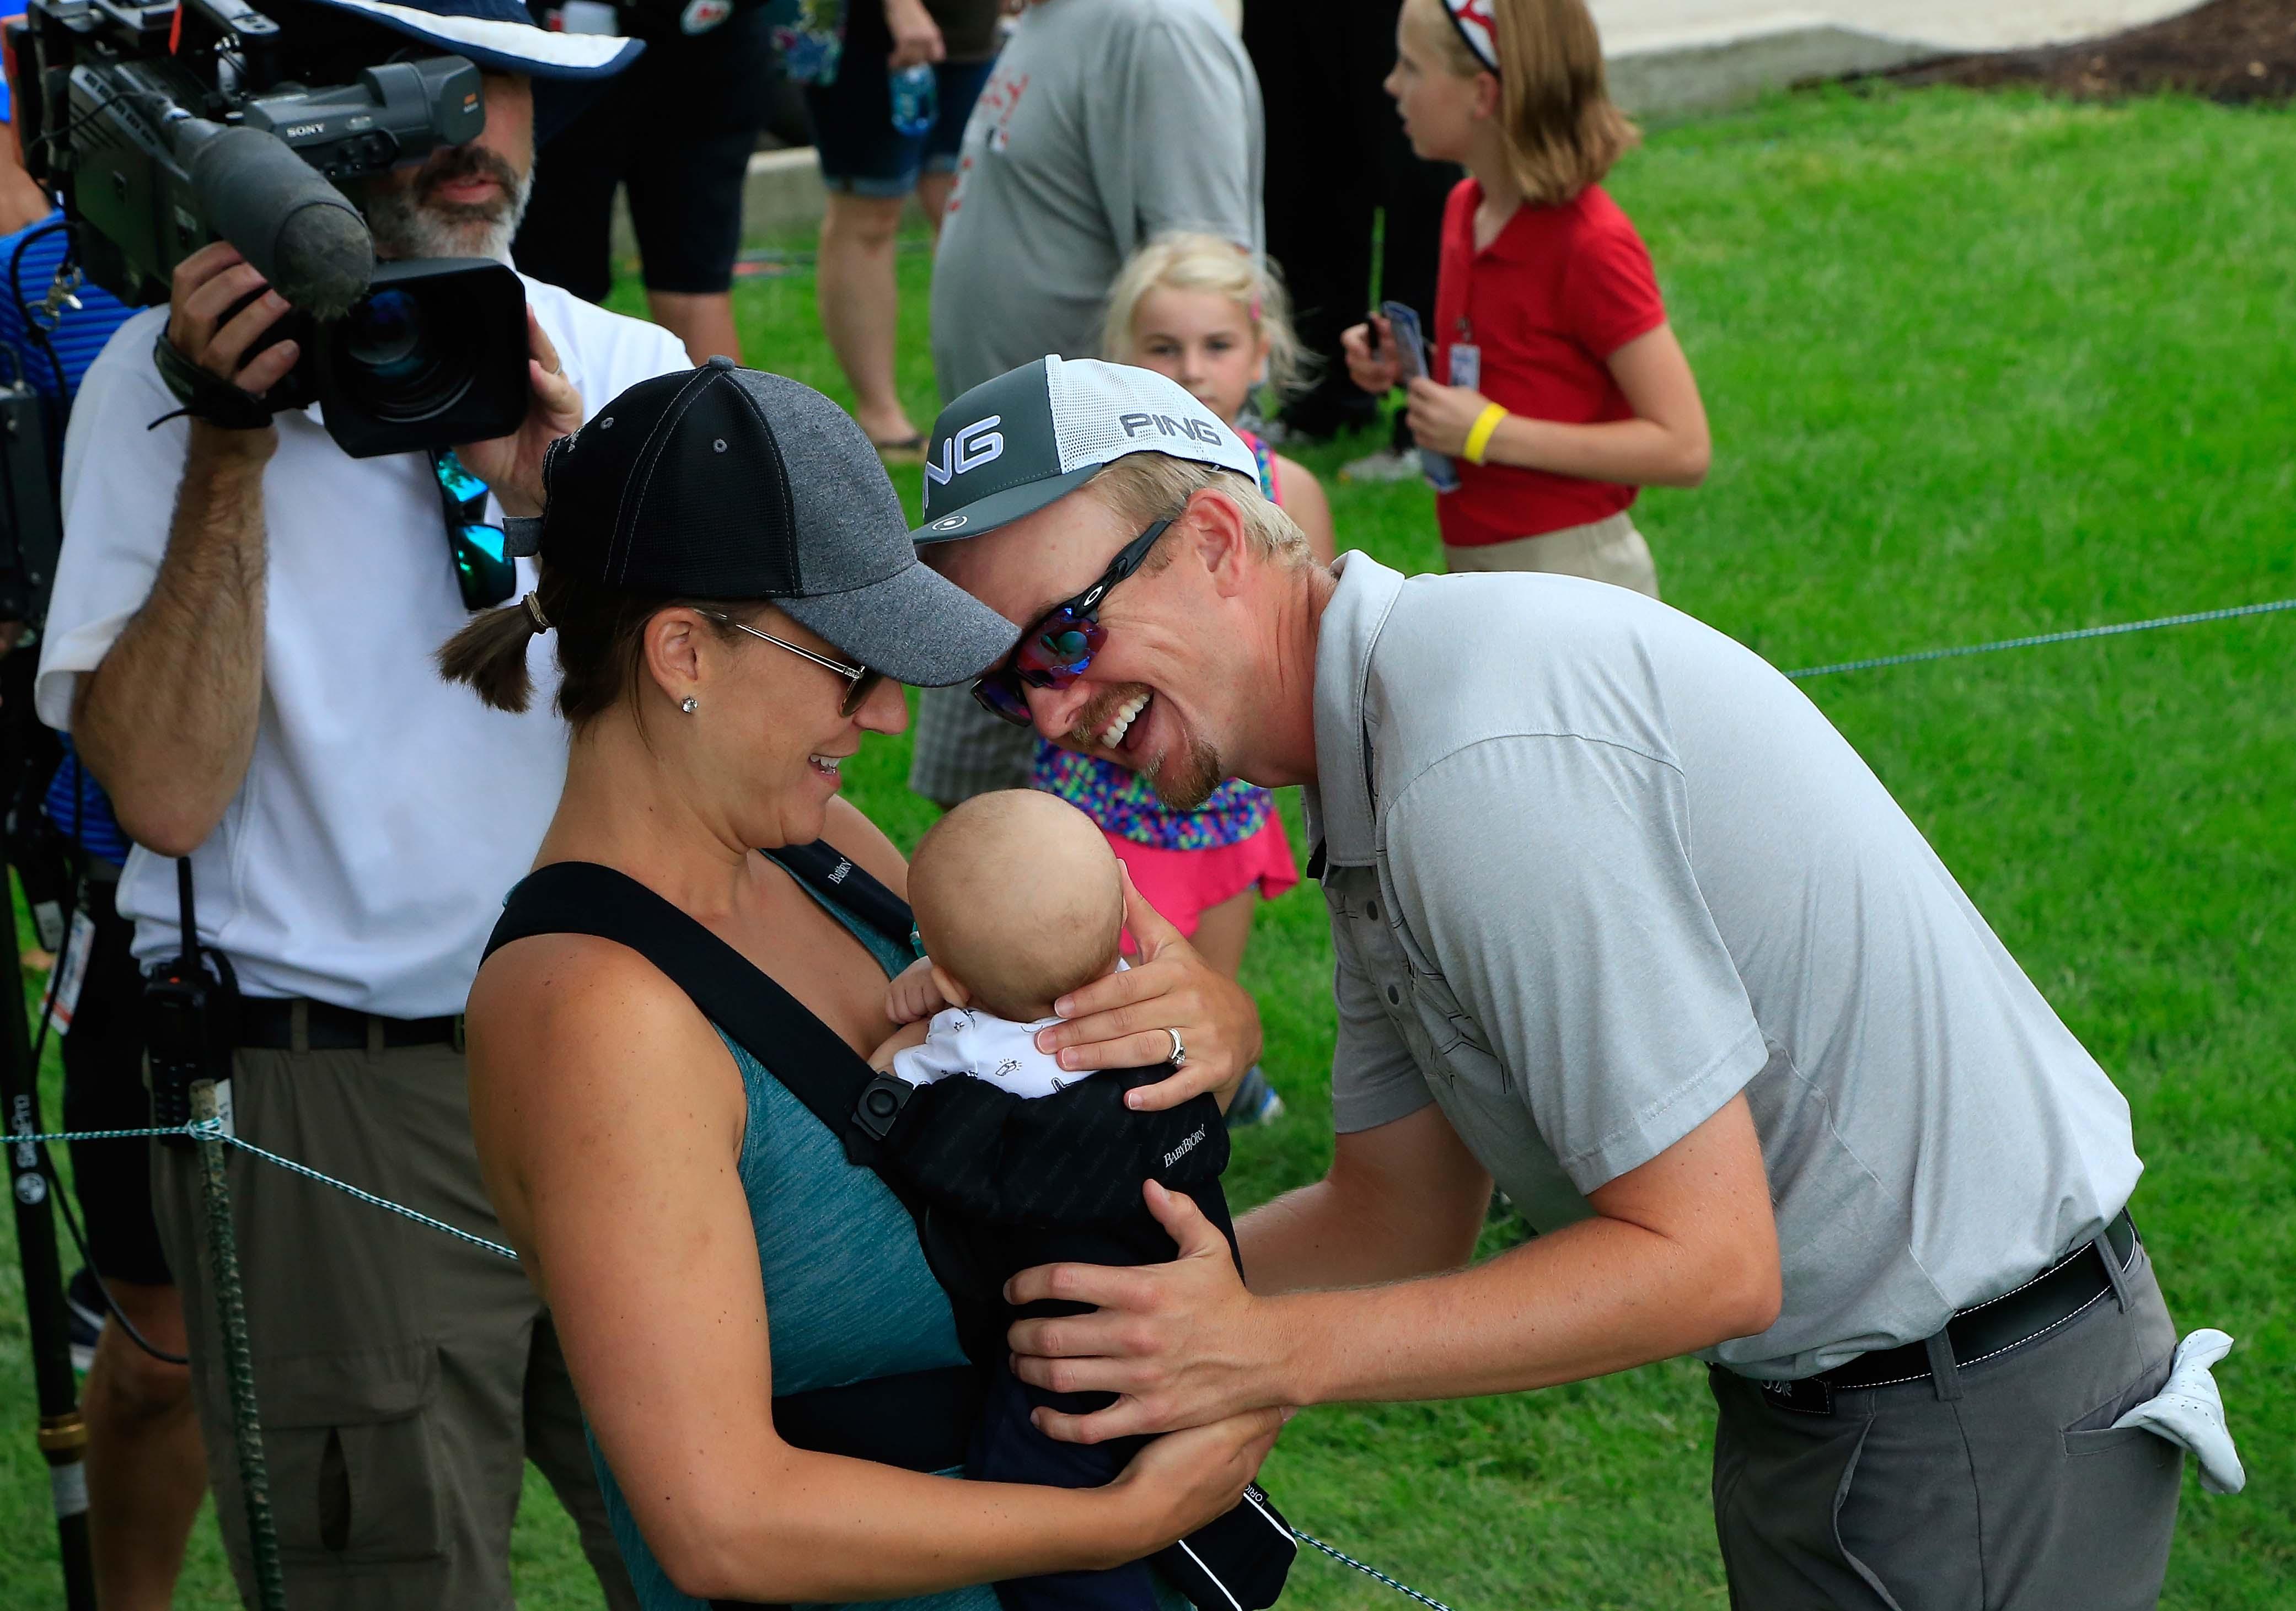 Jim, Heidi and Brady Knous